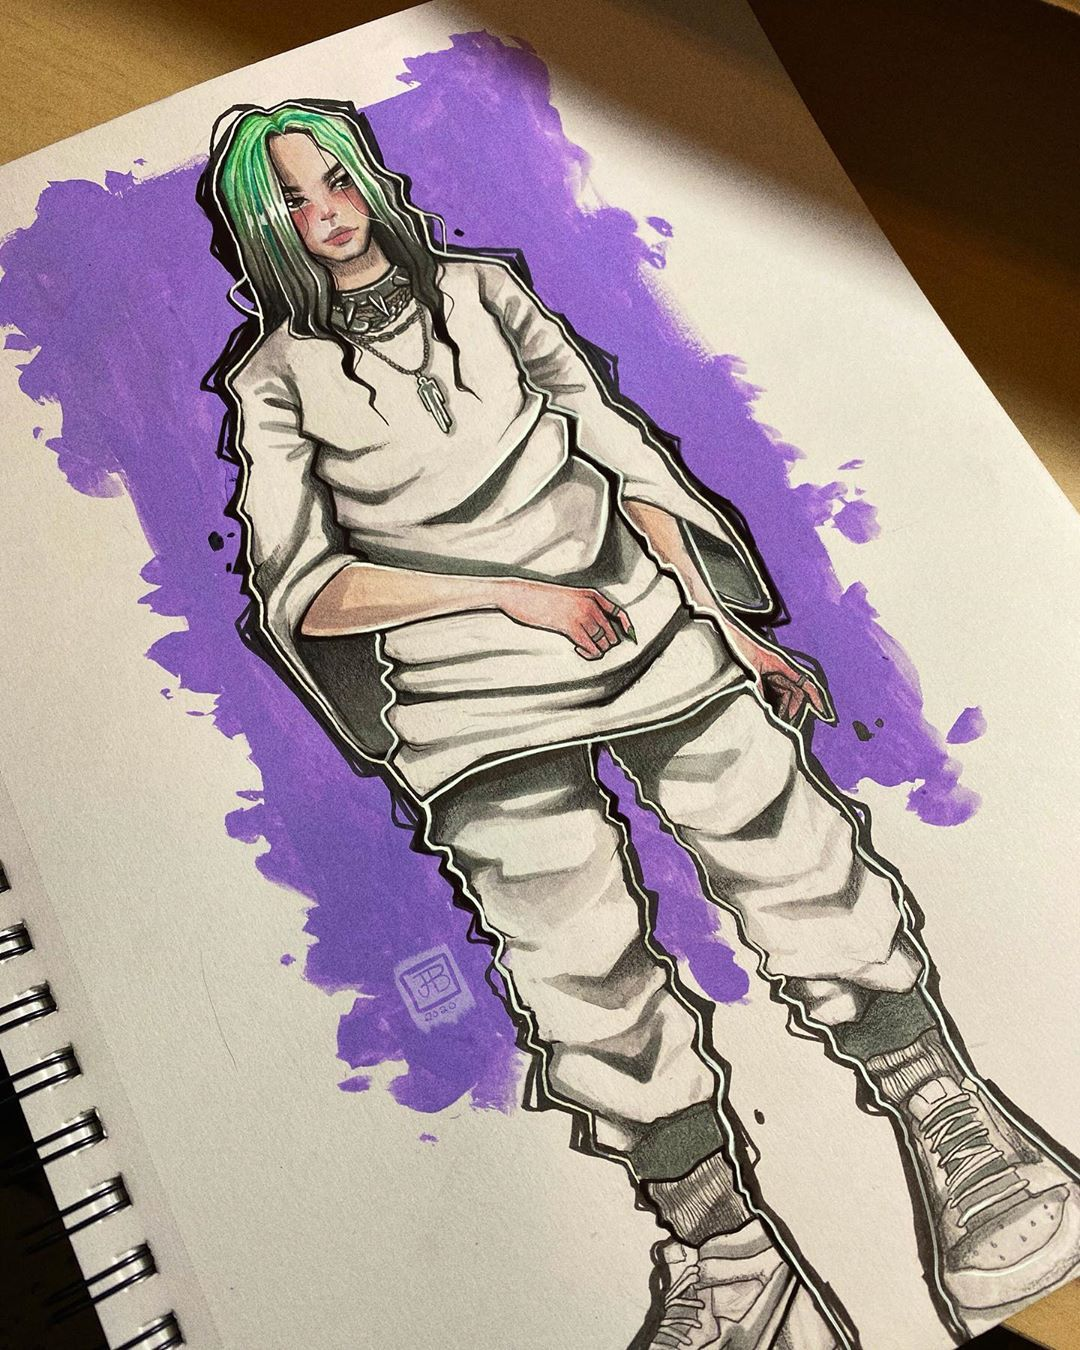 103 Likes 39 Comments Jeremy Manic Jerm On Instagram Billie Doodle Follow Me On Tiktok Manic Jerm Billie Billie Eilish Drawings